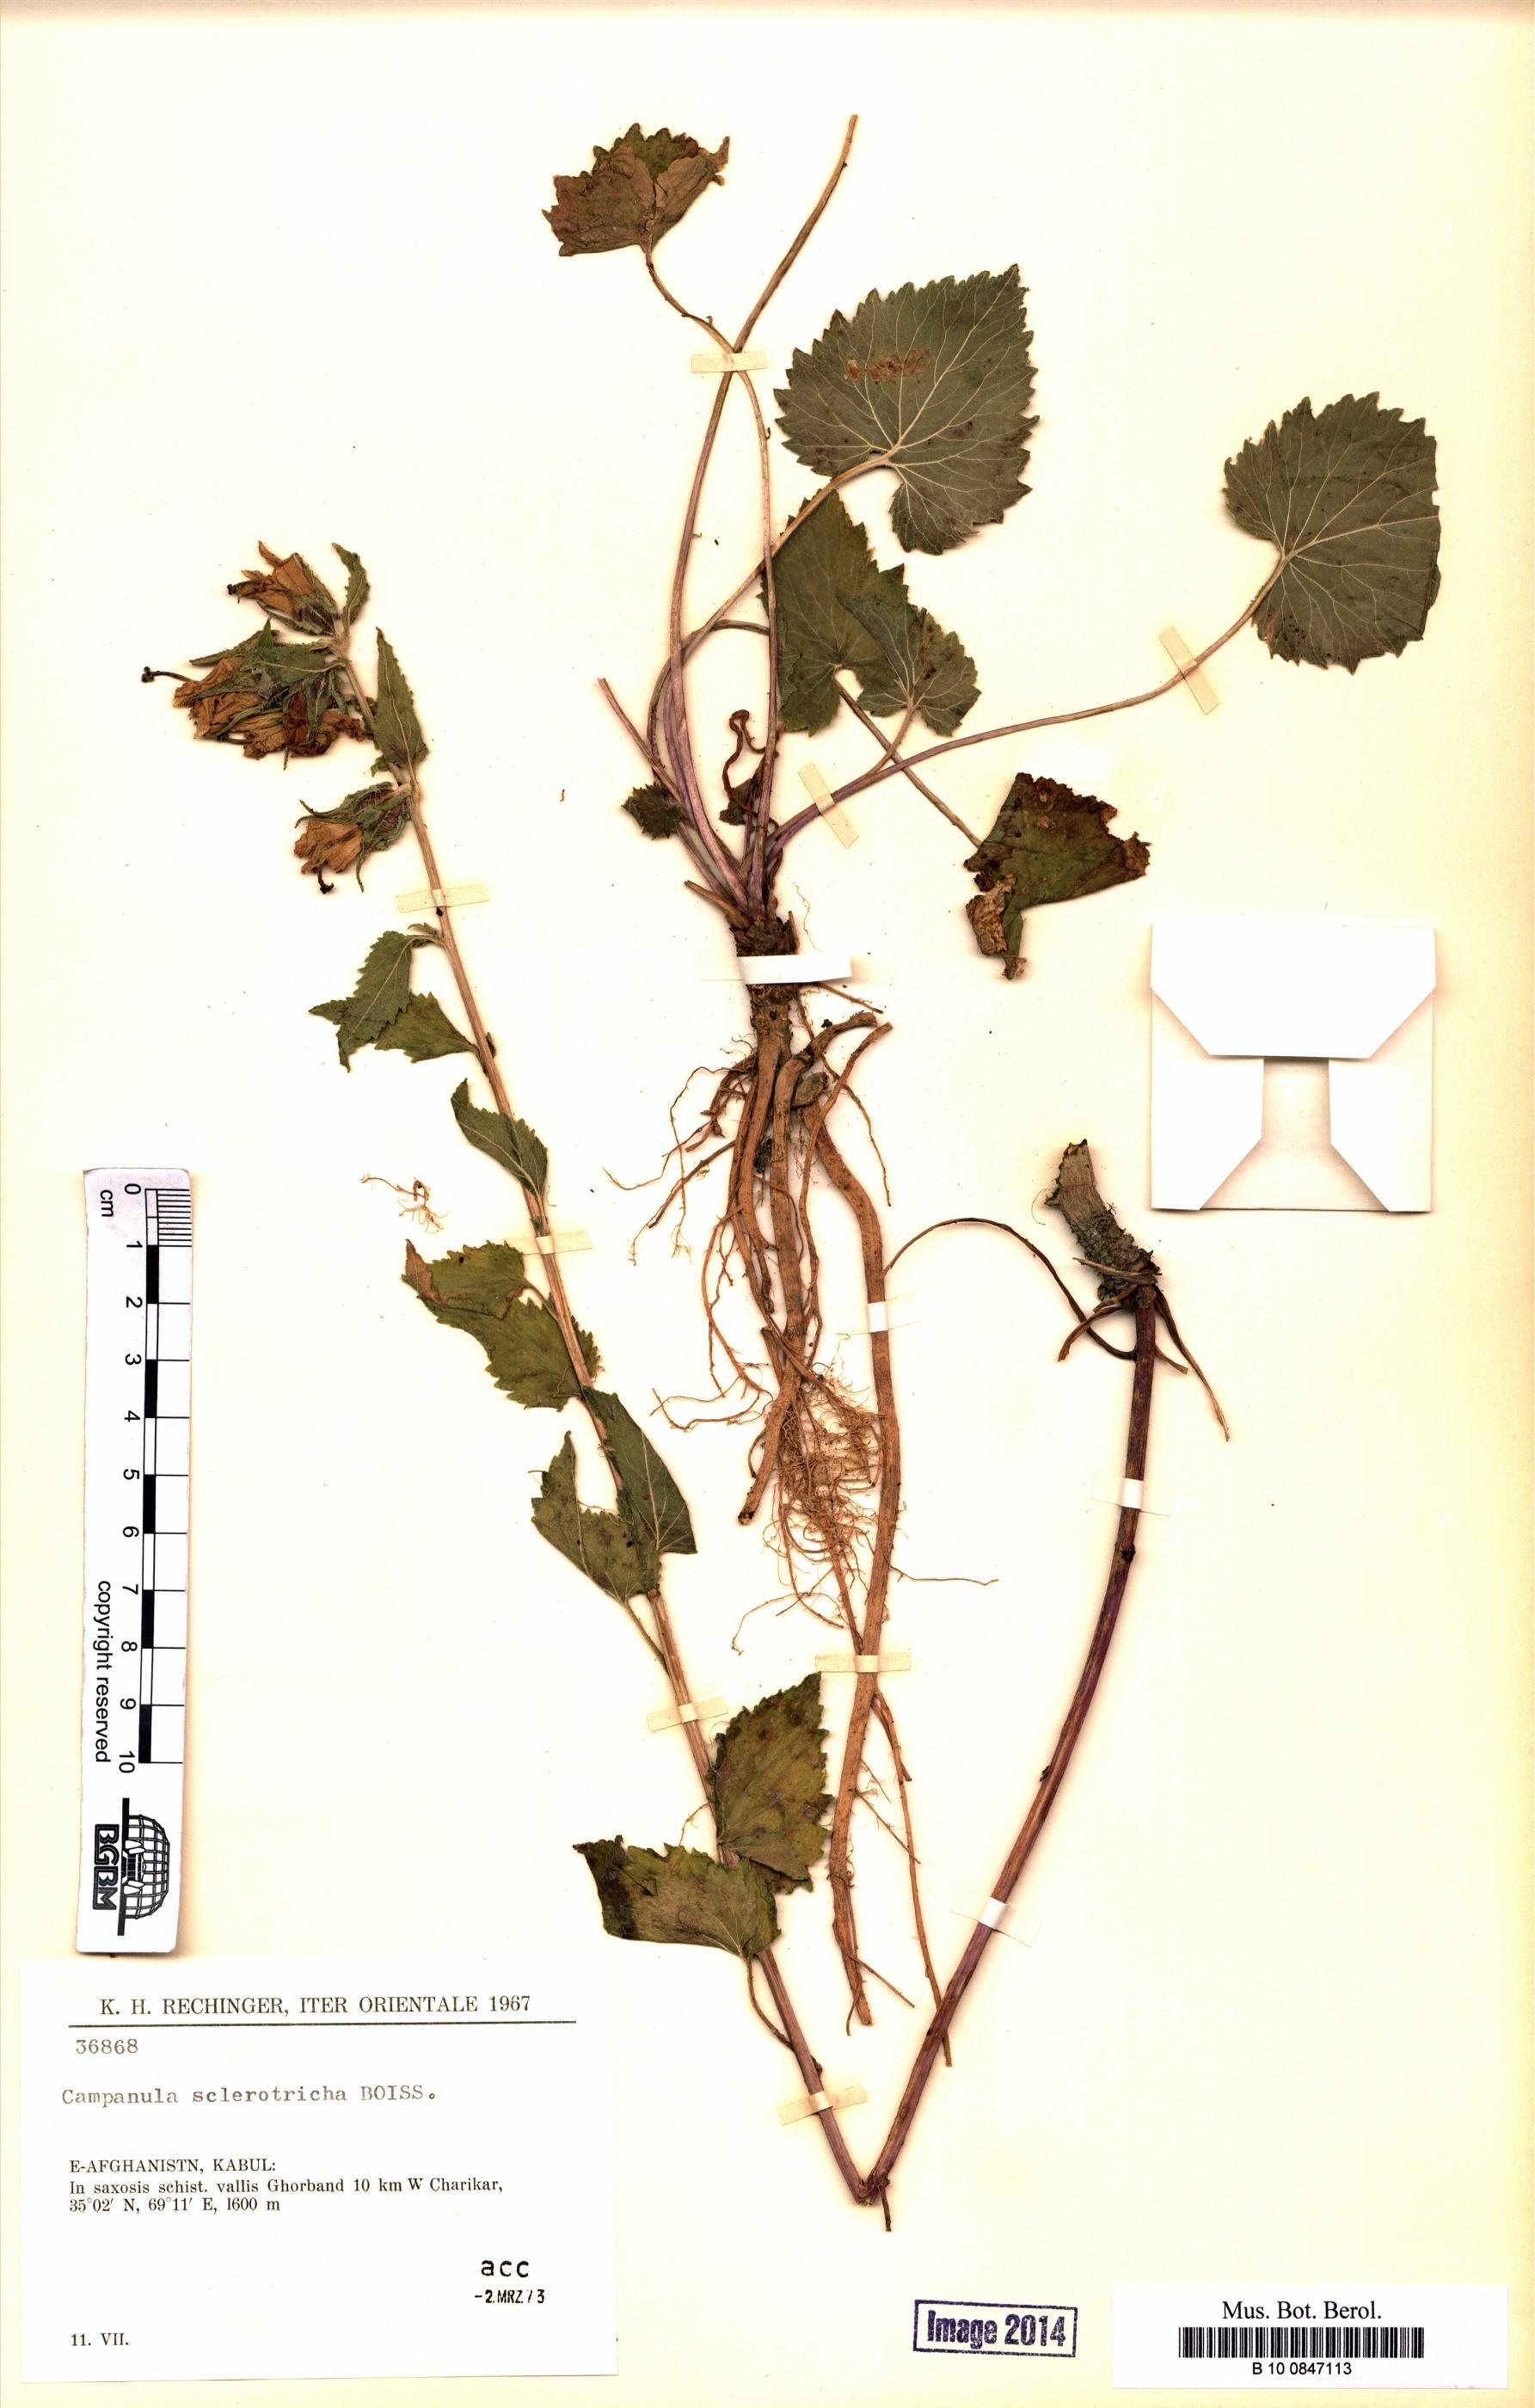 http://ww2.bgbm.org/herbarium/images/B/10/08/47/11/B_10_0847113.jpg